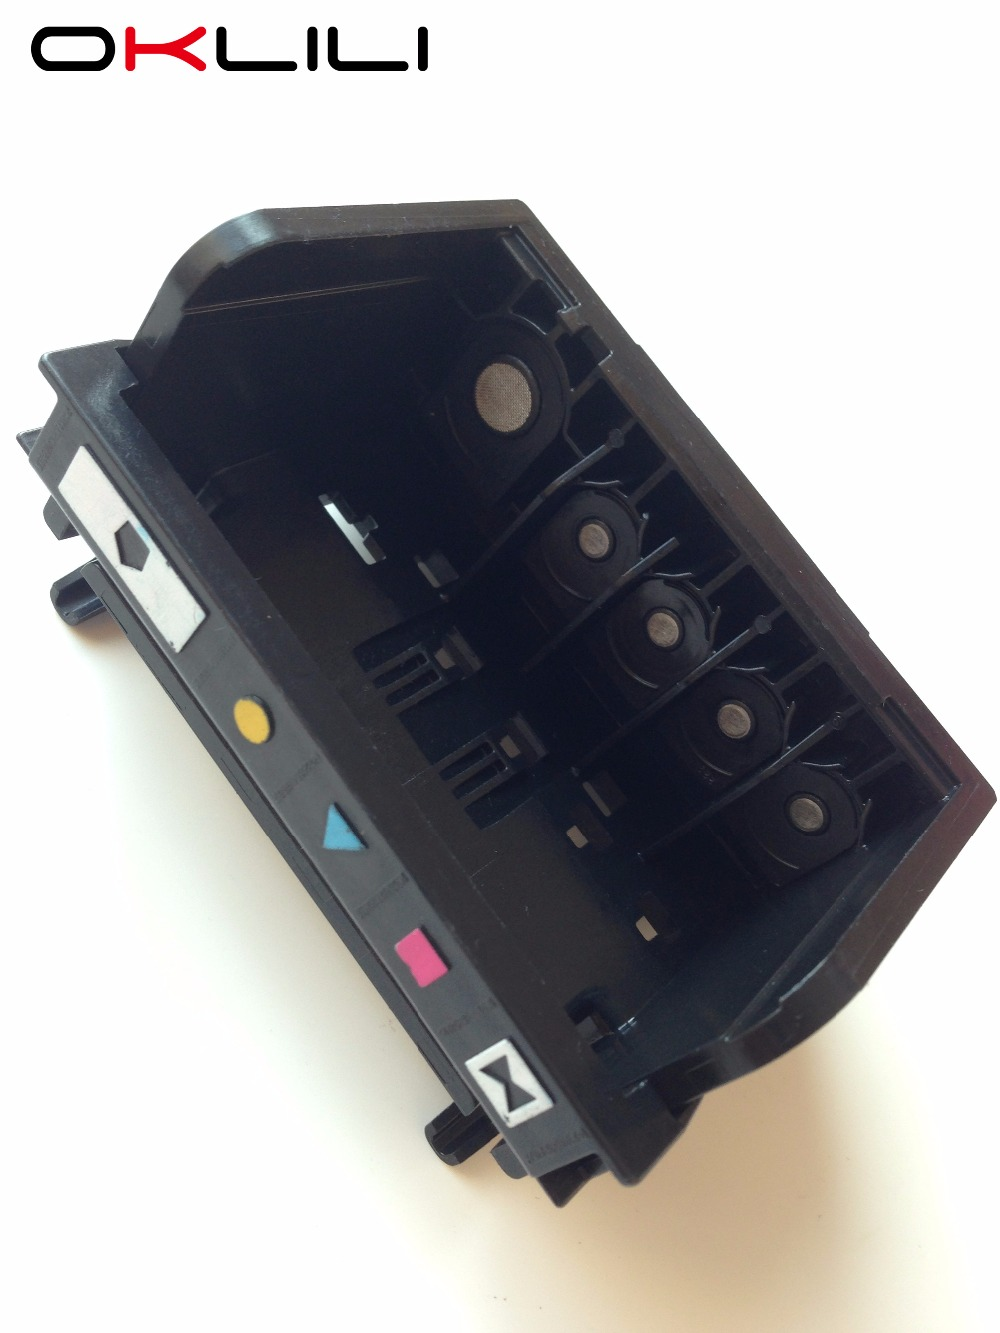 CB326-30002 CN642A 564 564XL 5-слот для друкувальної голівки для HP 7510 7520 D5460 D7560 B8550 C5370 C5380 C6300 C6380 D5400 D7560